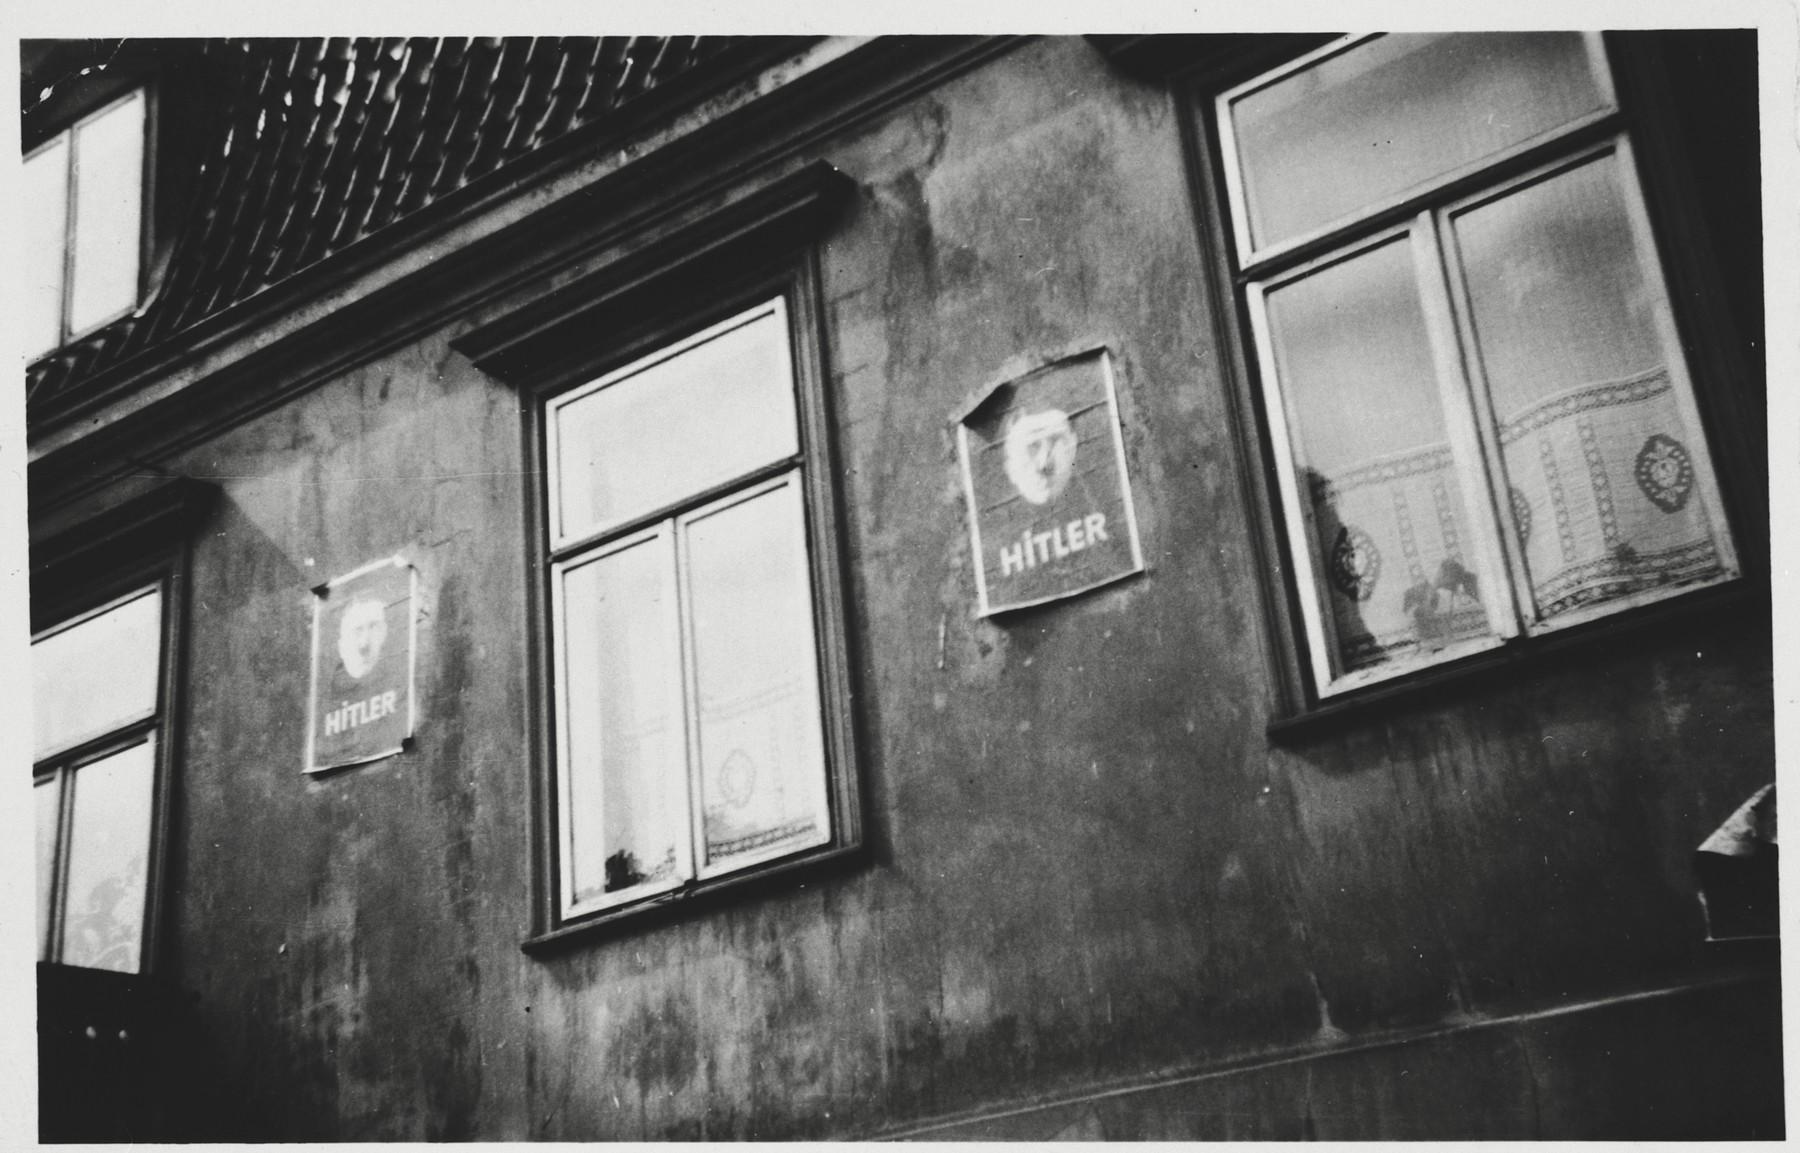 Posters of Adolf Hitler bedeck a building in Kiel.